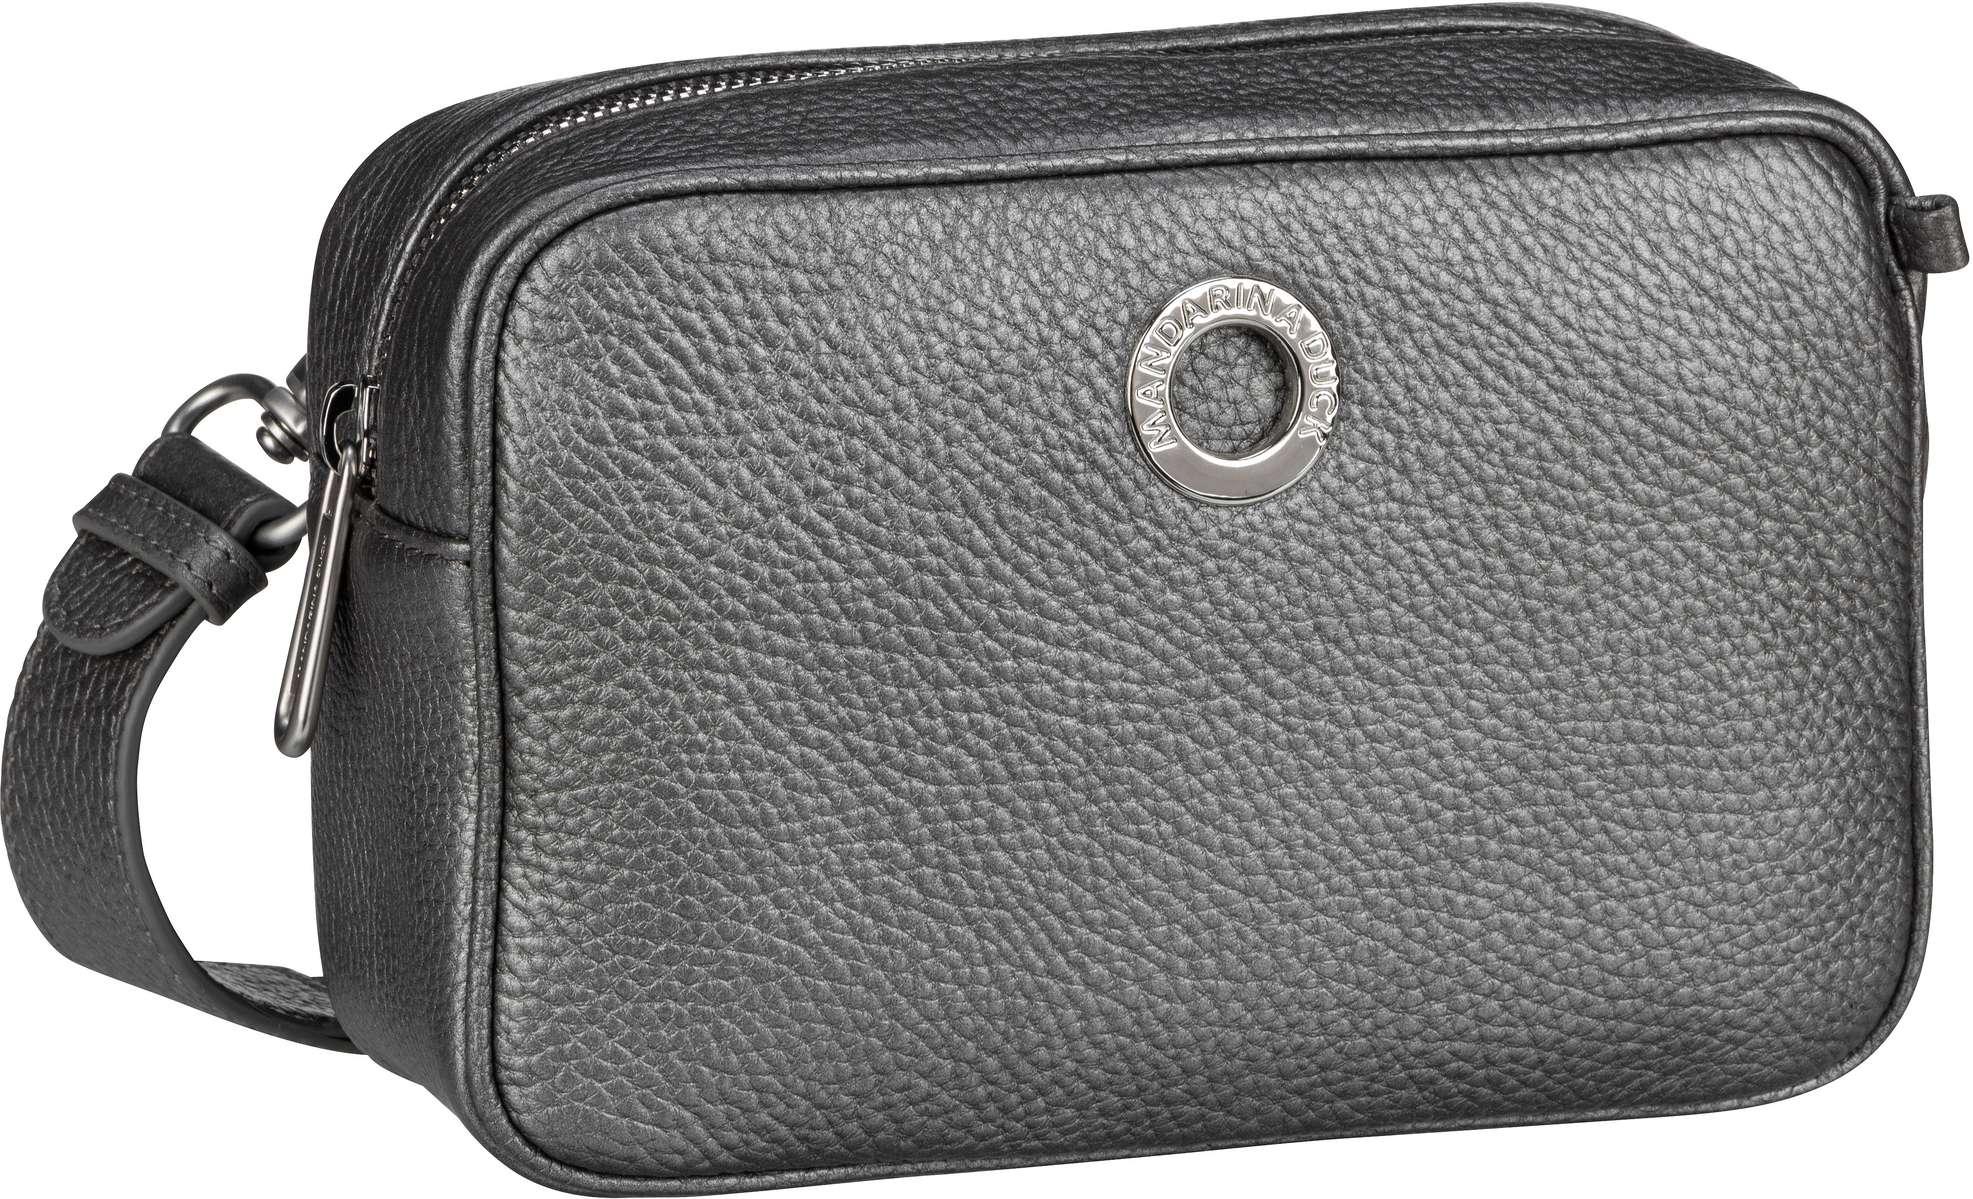 Umhängetasche Mellow Leather Lux Camera Bag ZLT22 Lead